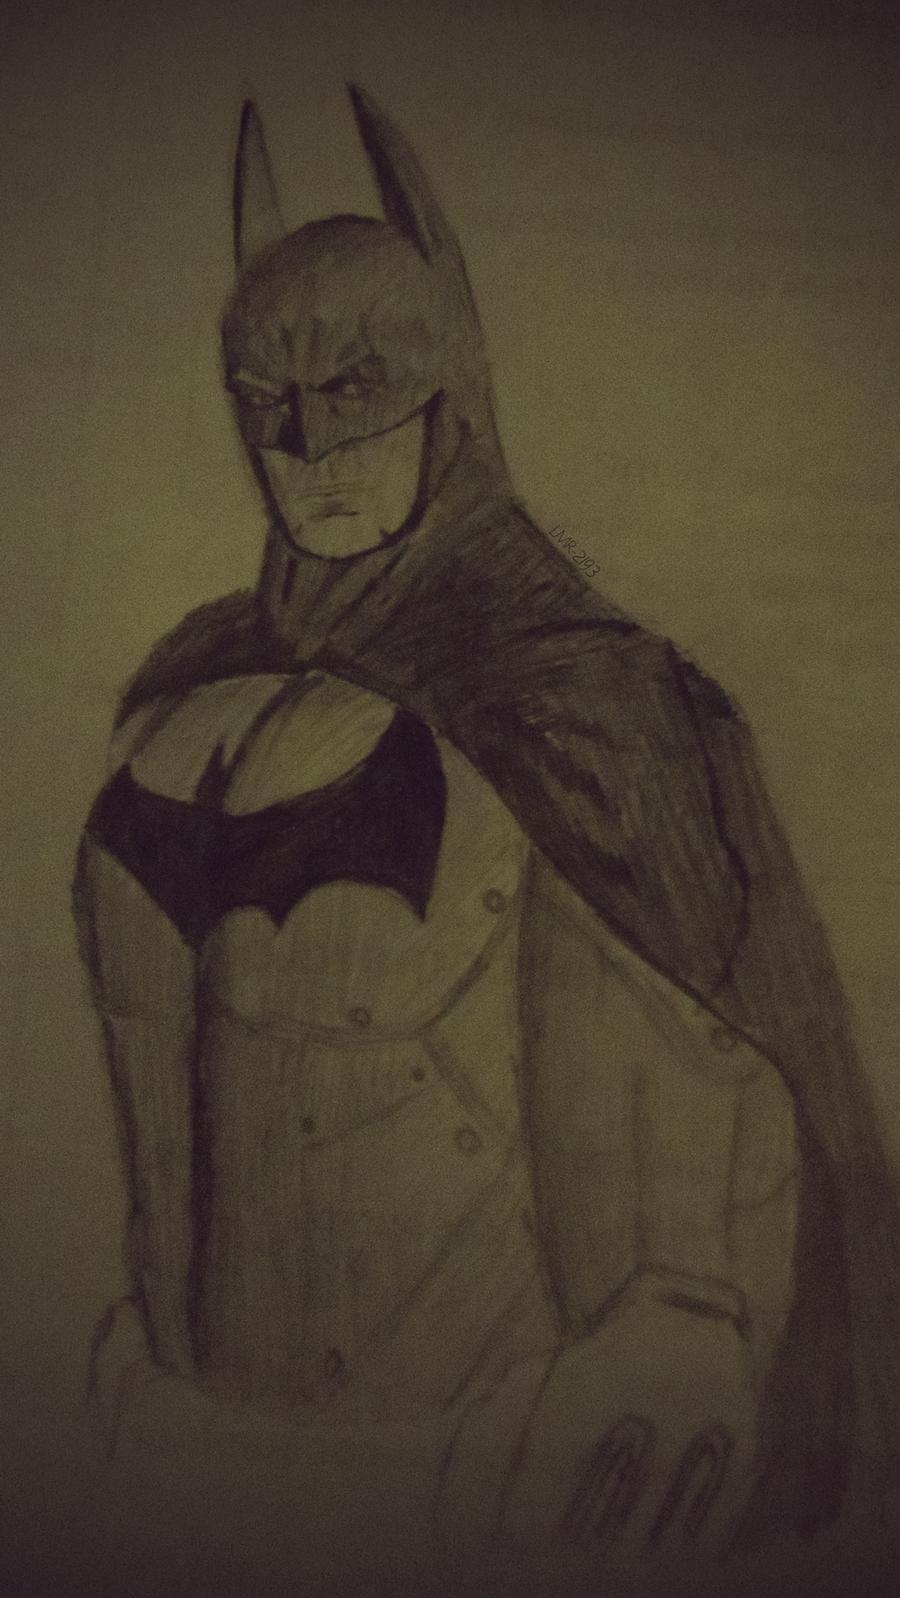 Batman Arkham City Drawing by LMR-2193 on DeviantArt